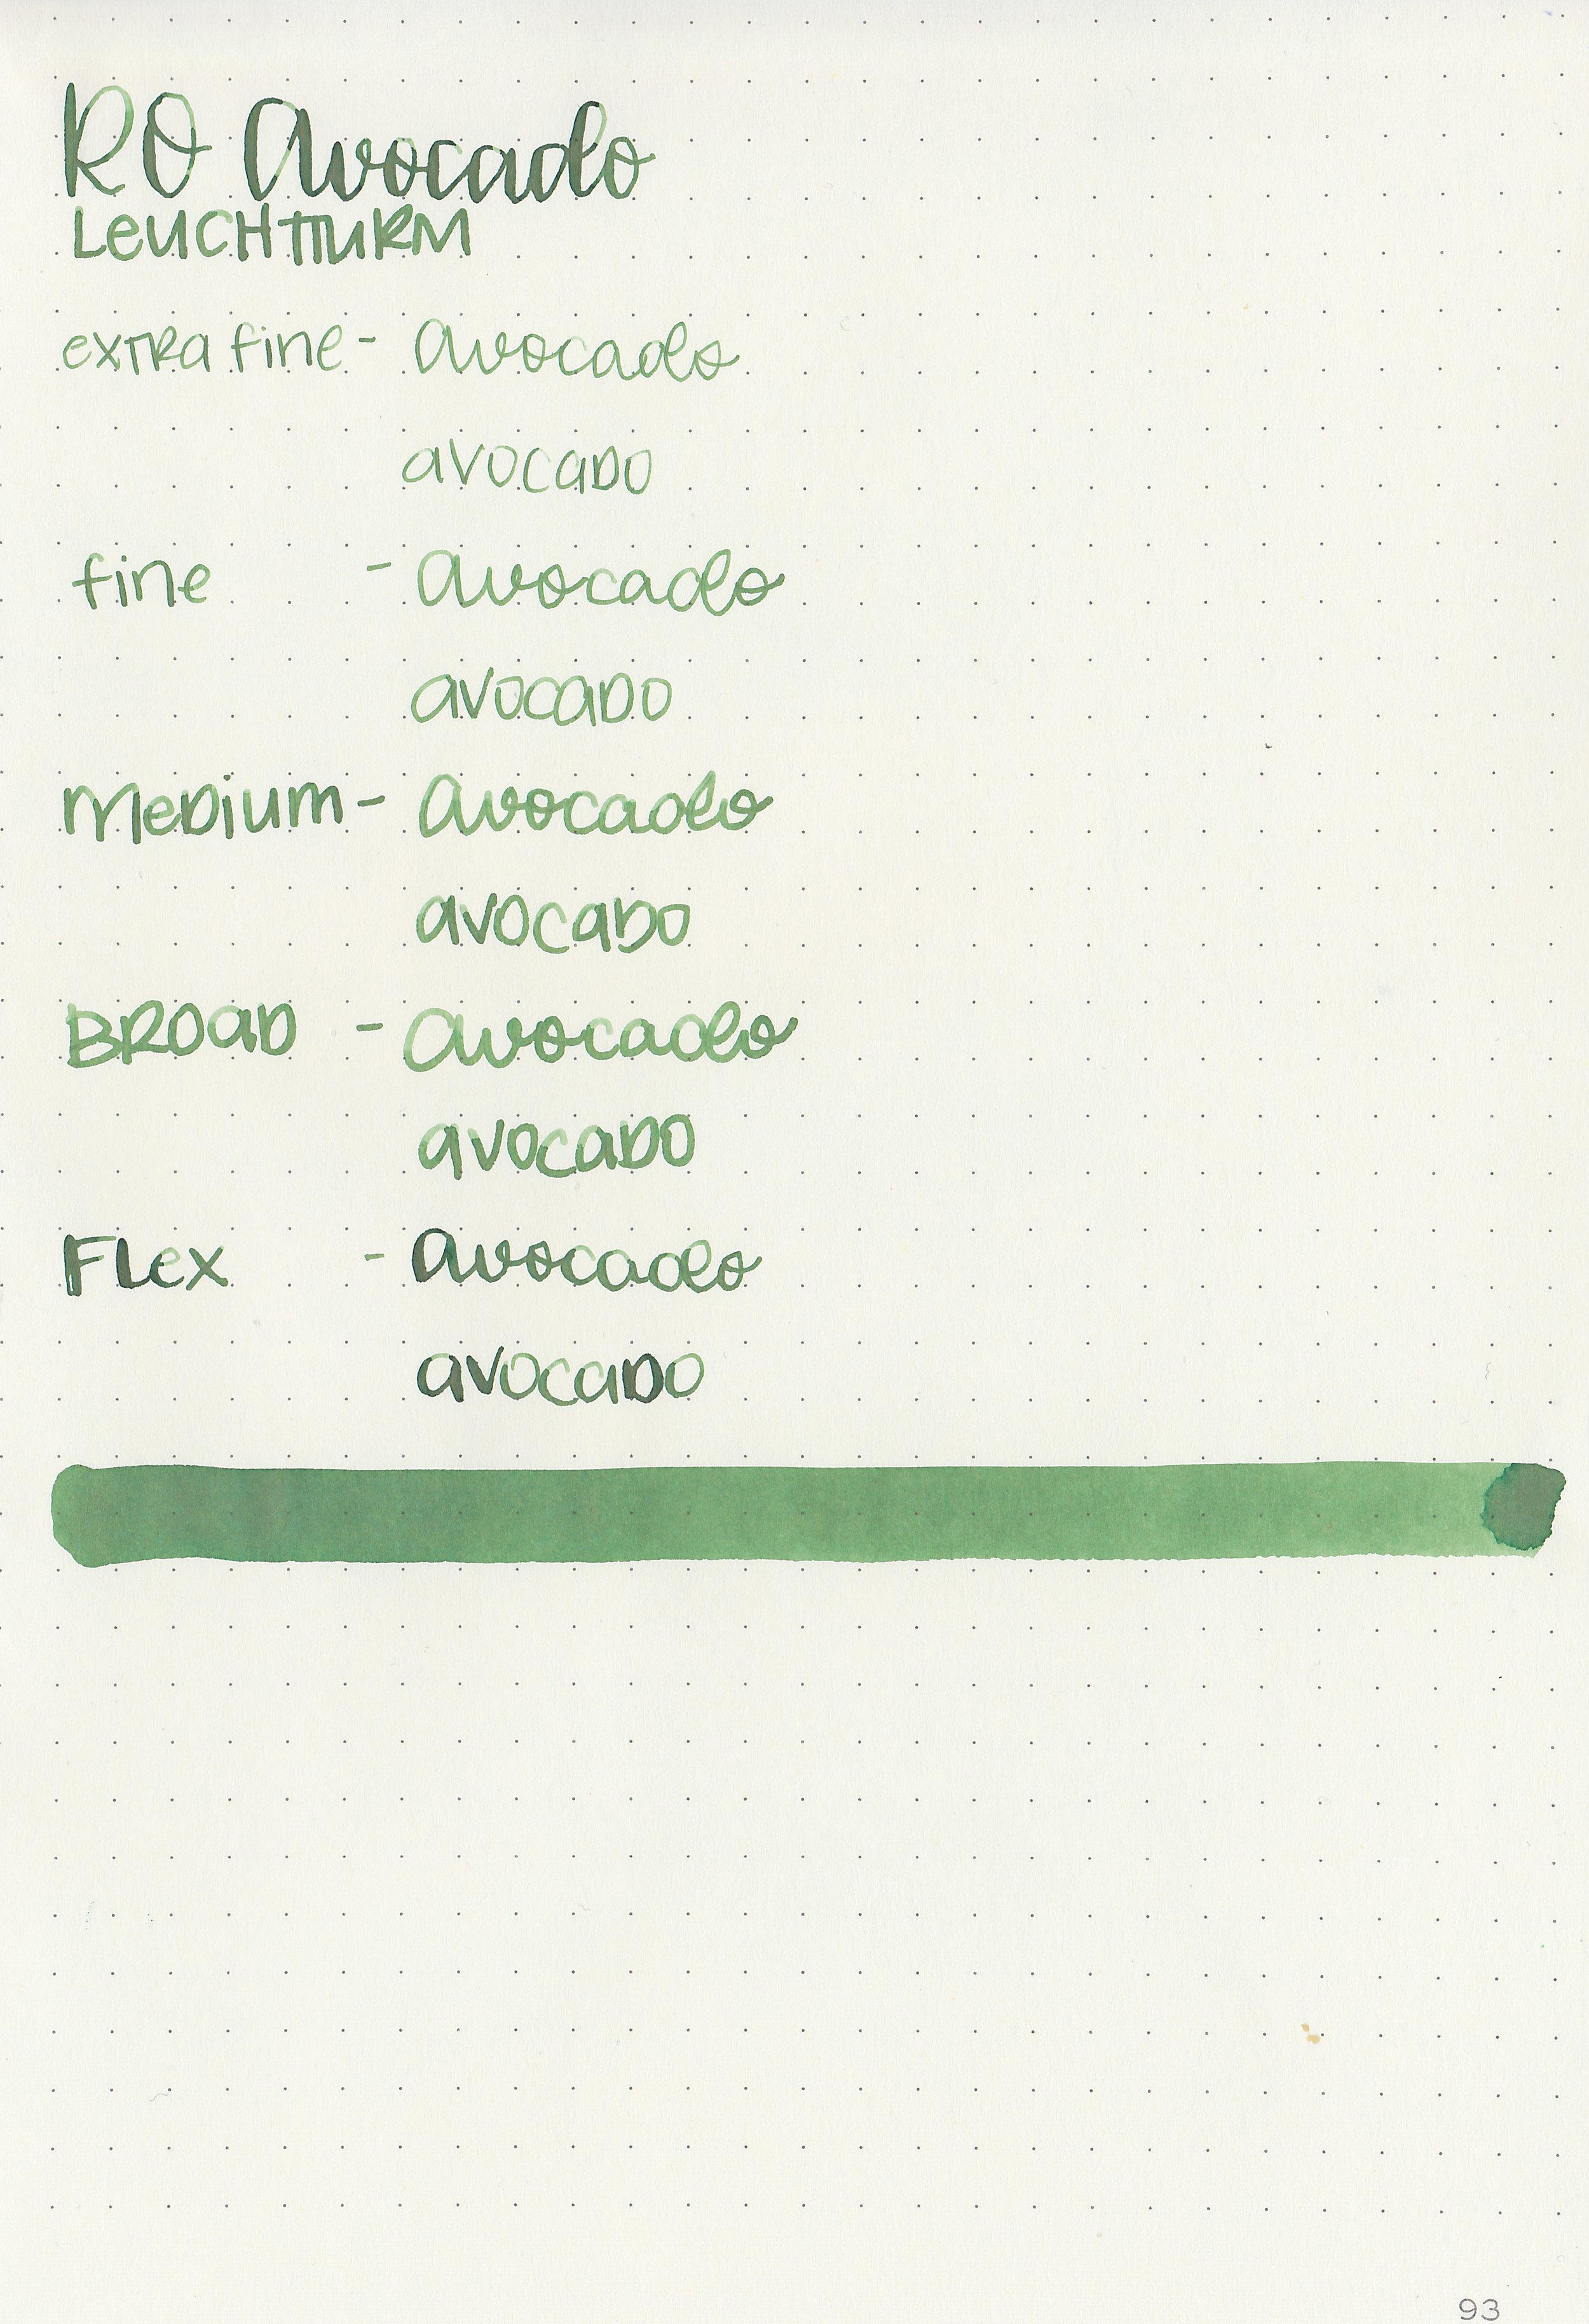 ro-avocado-9.jpg